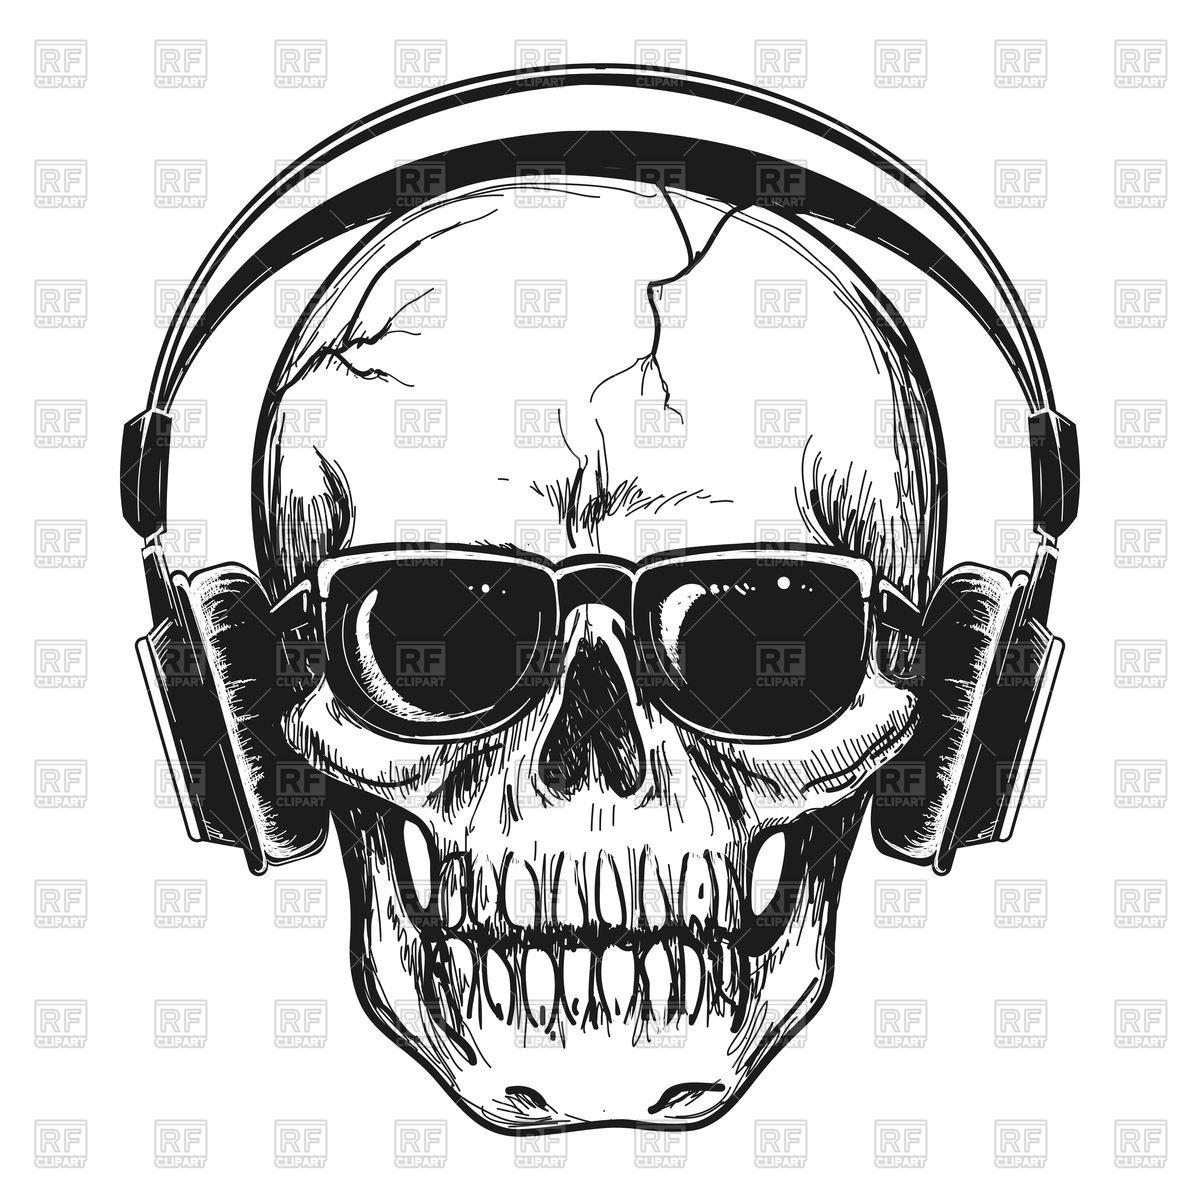 1200x1200 Human Skull With Headphones And Sunglasses Enjoying Music Royalty